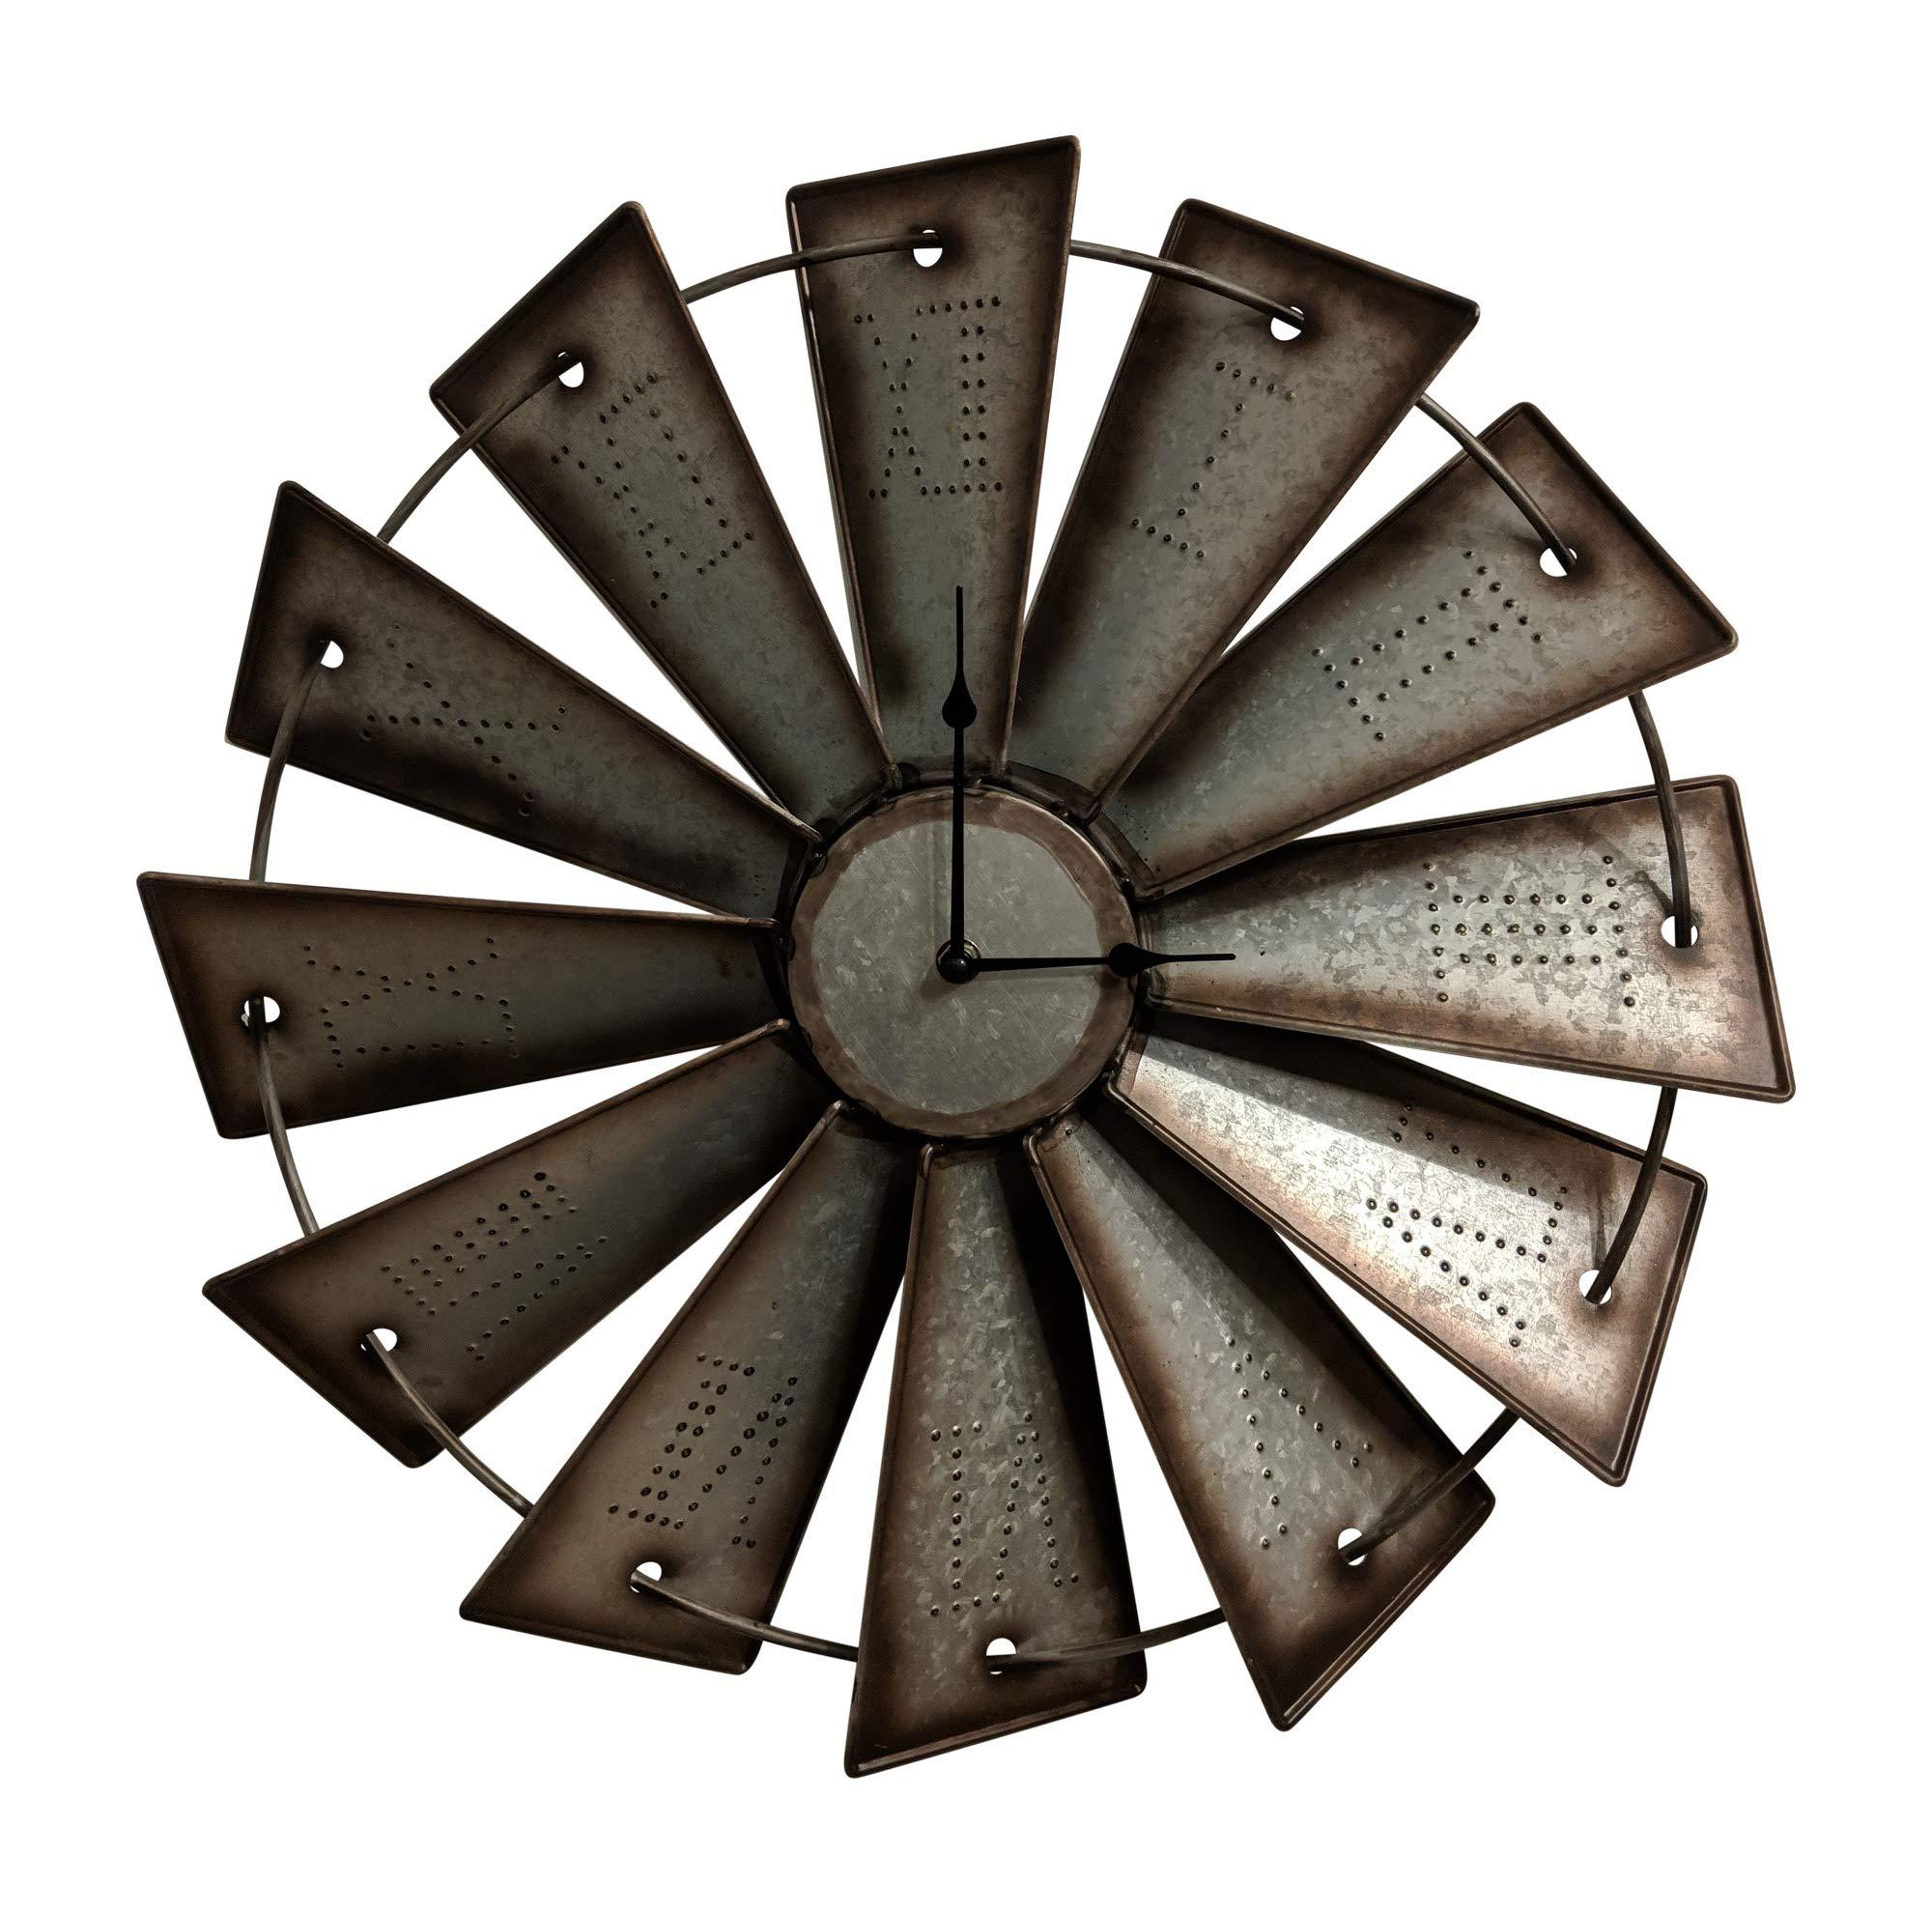 Gianna's Home Rustic Farmhouse Metal Windmill Wall Clock (18.5'')